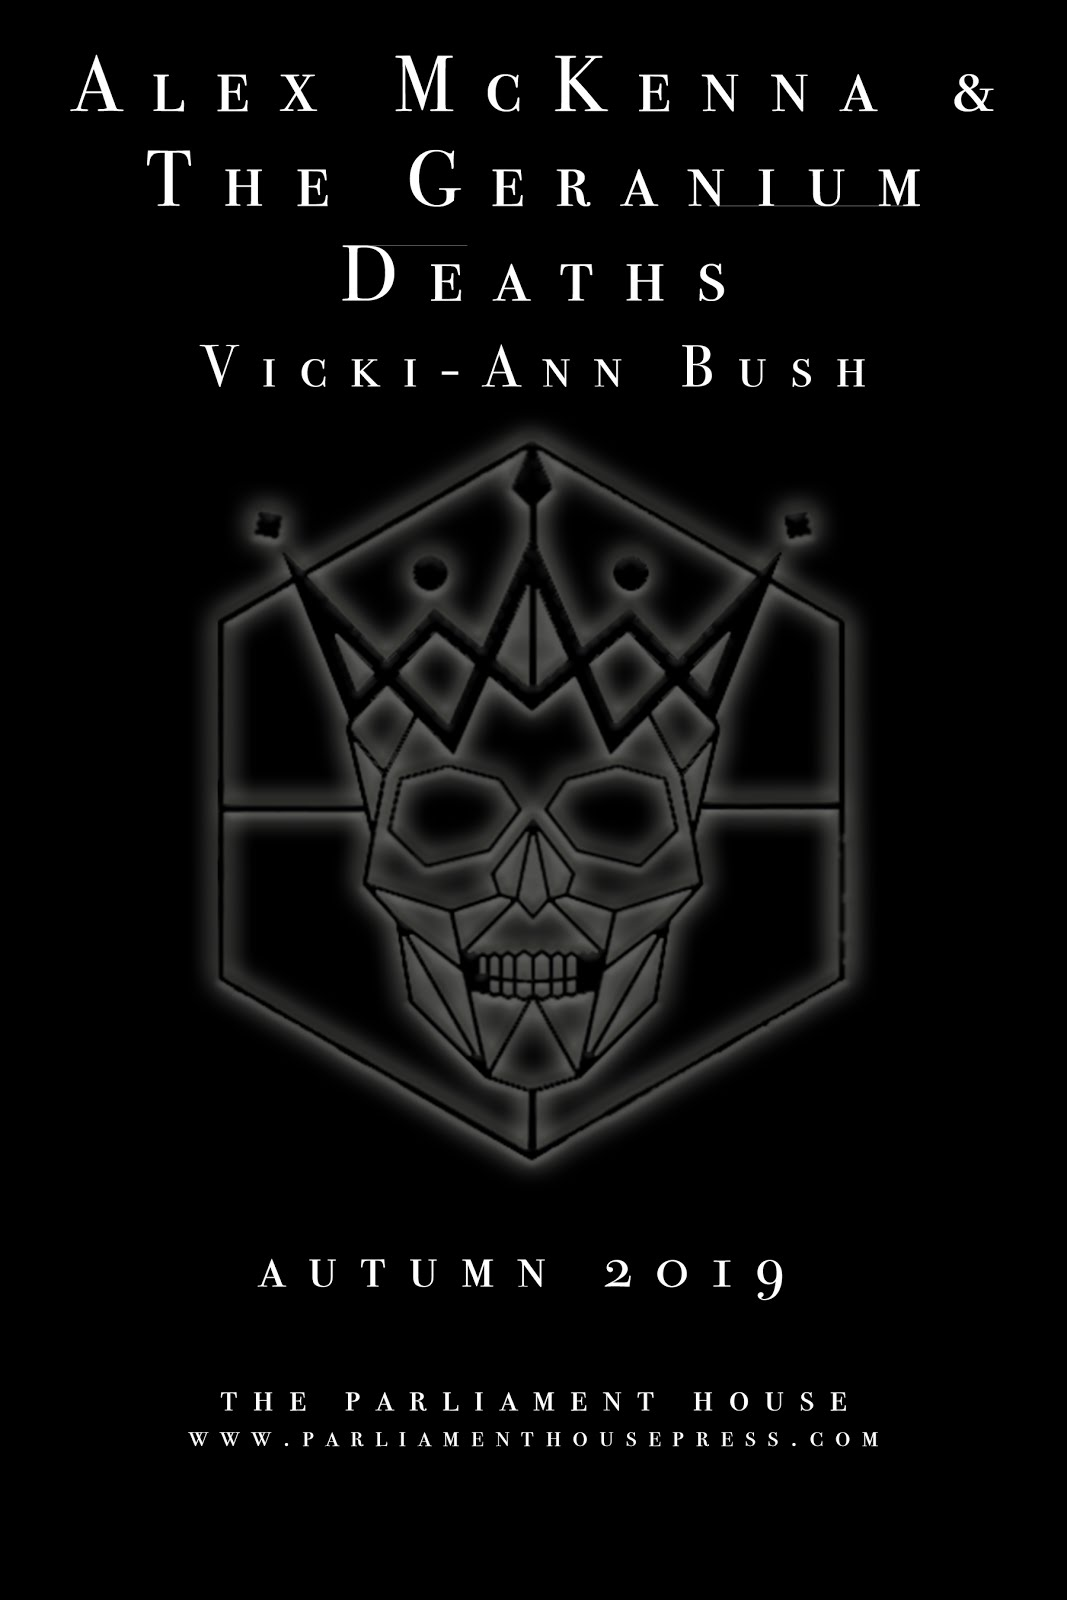 Coming Fall 2019